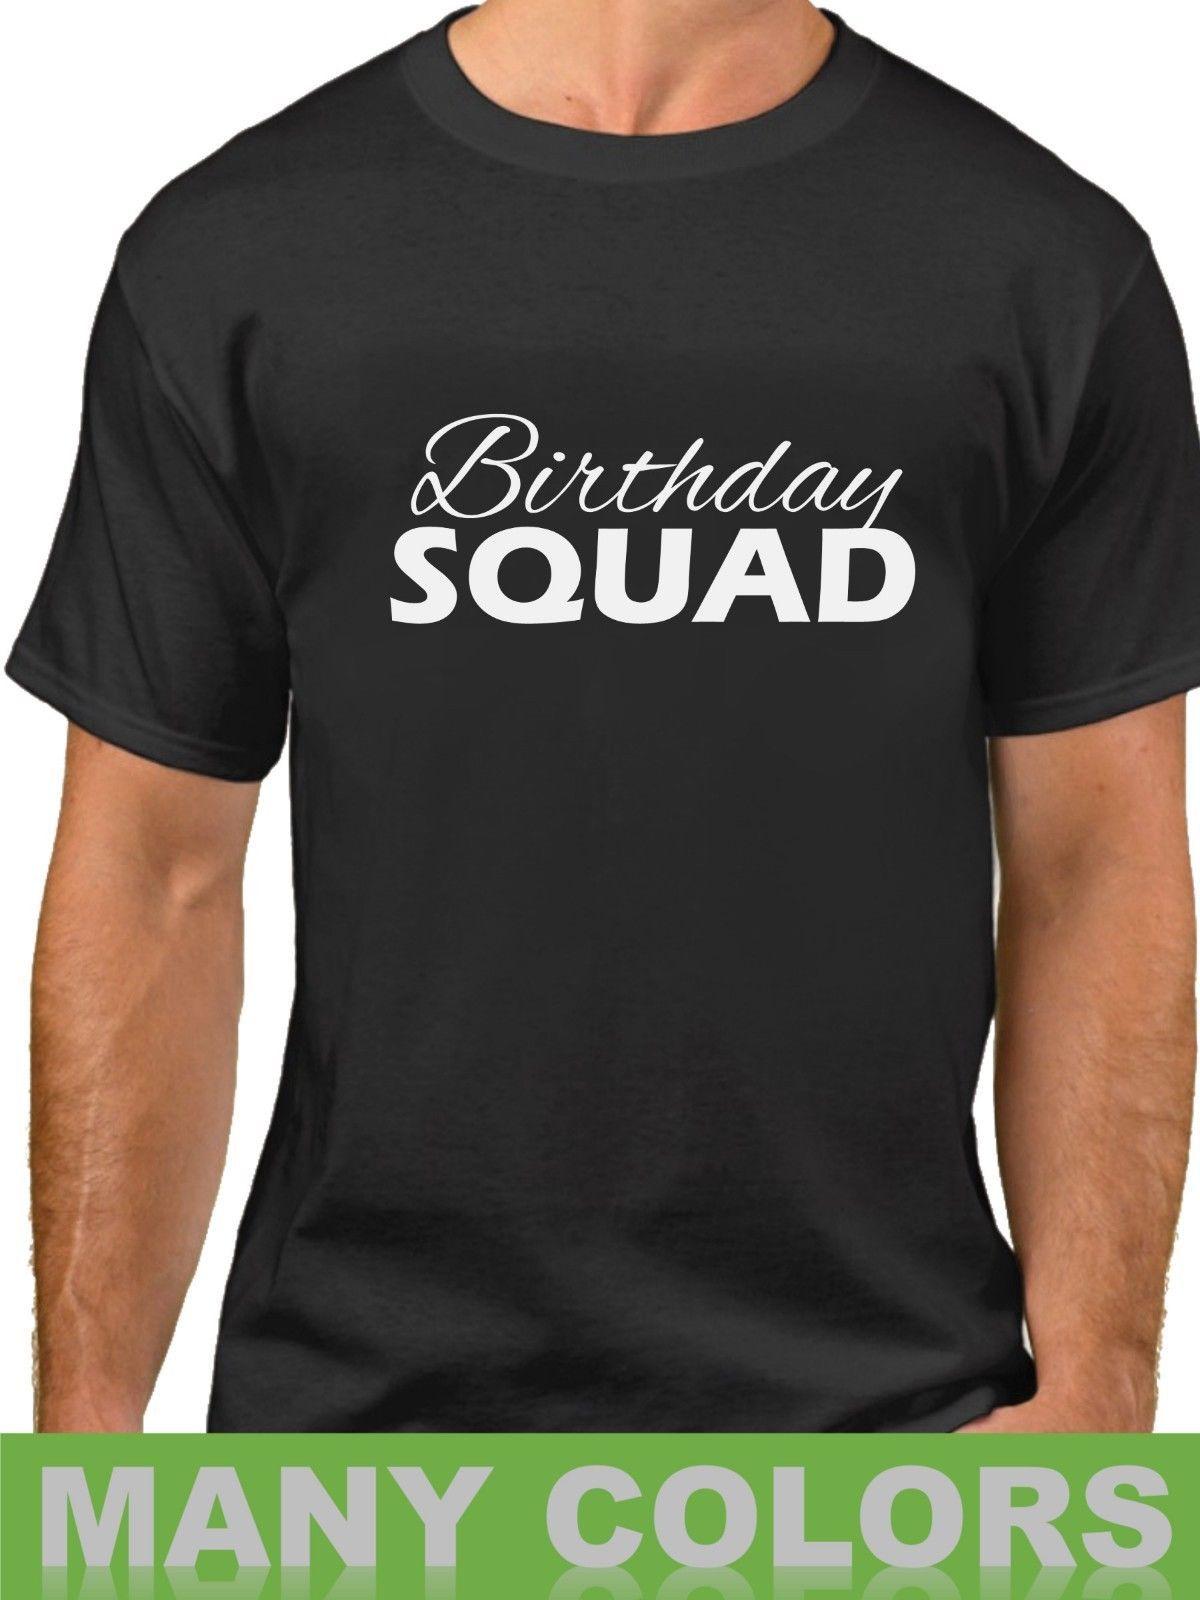 Details Zu Birthday Squad 2 Shirt Bday T